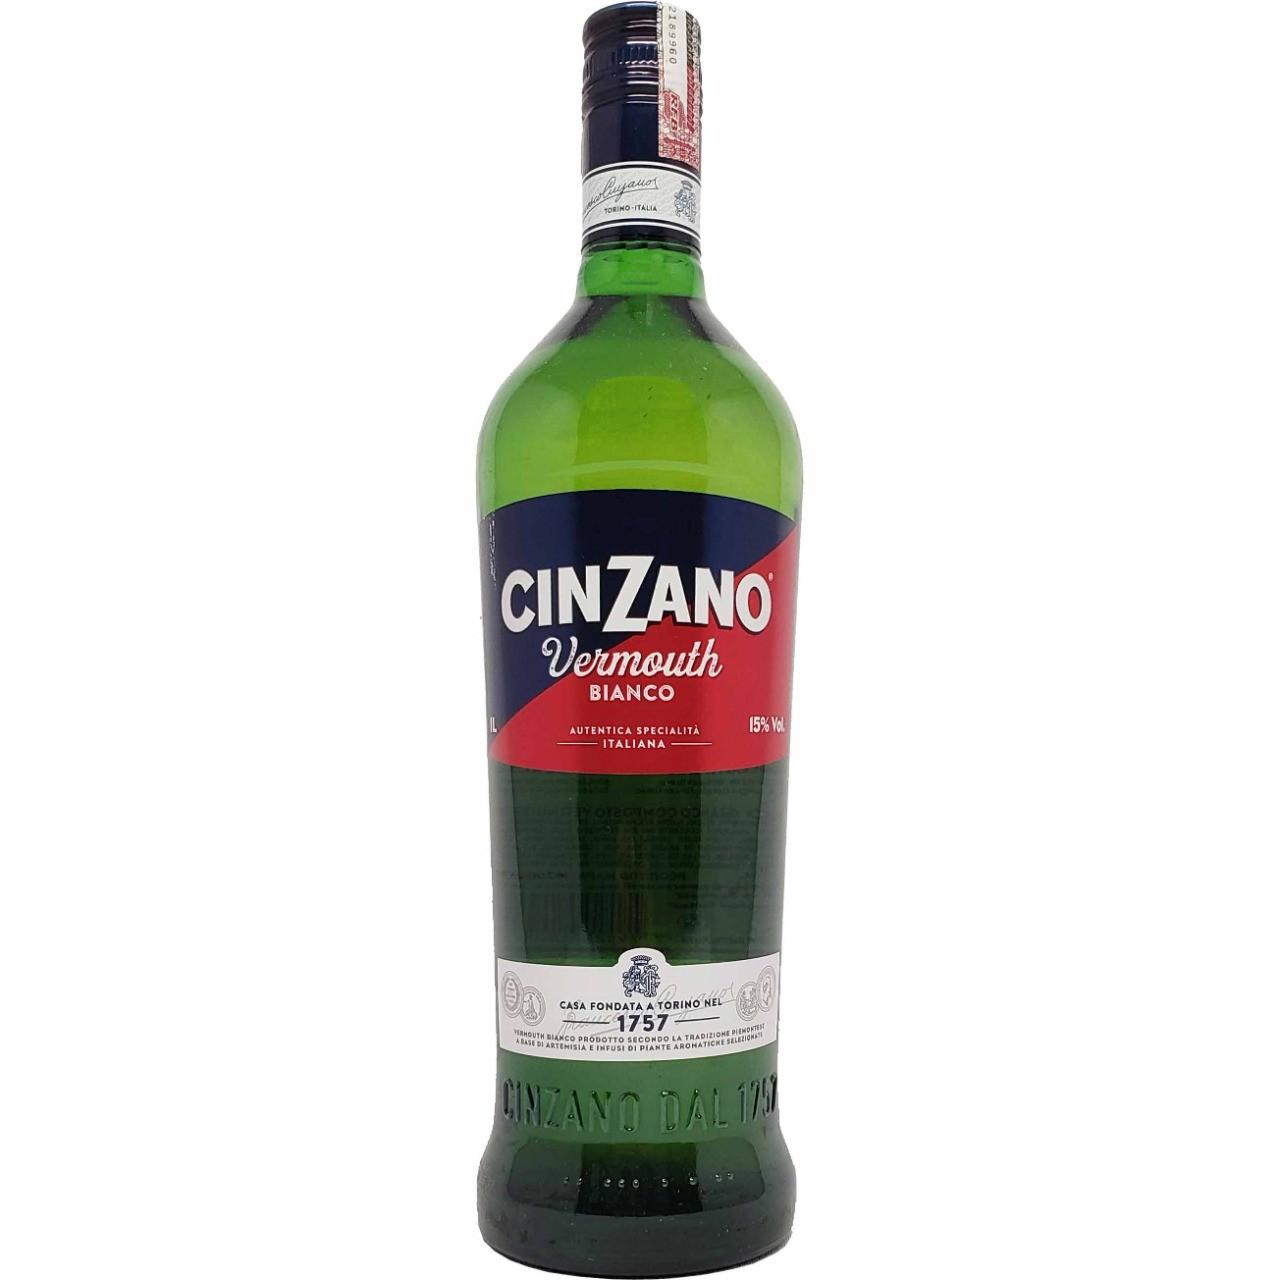 Cinzano Vermouth Bianco - 1L -